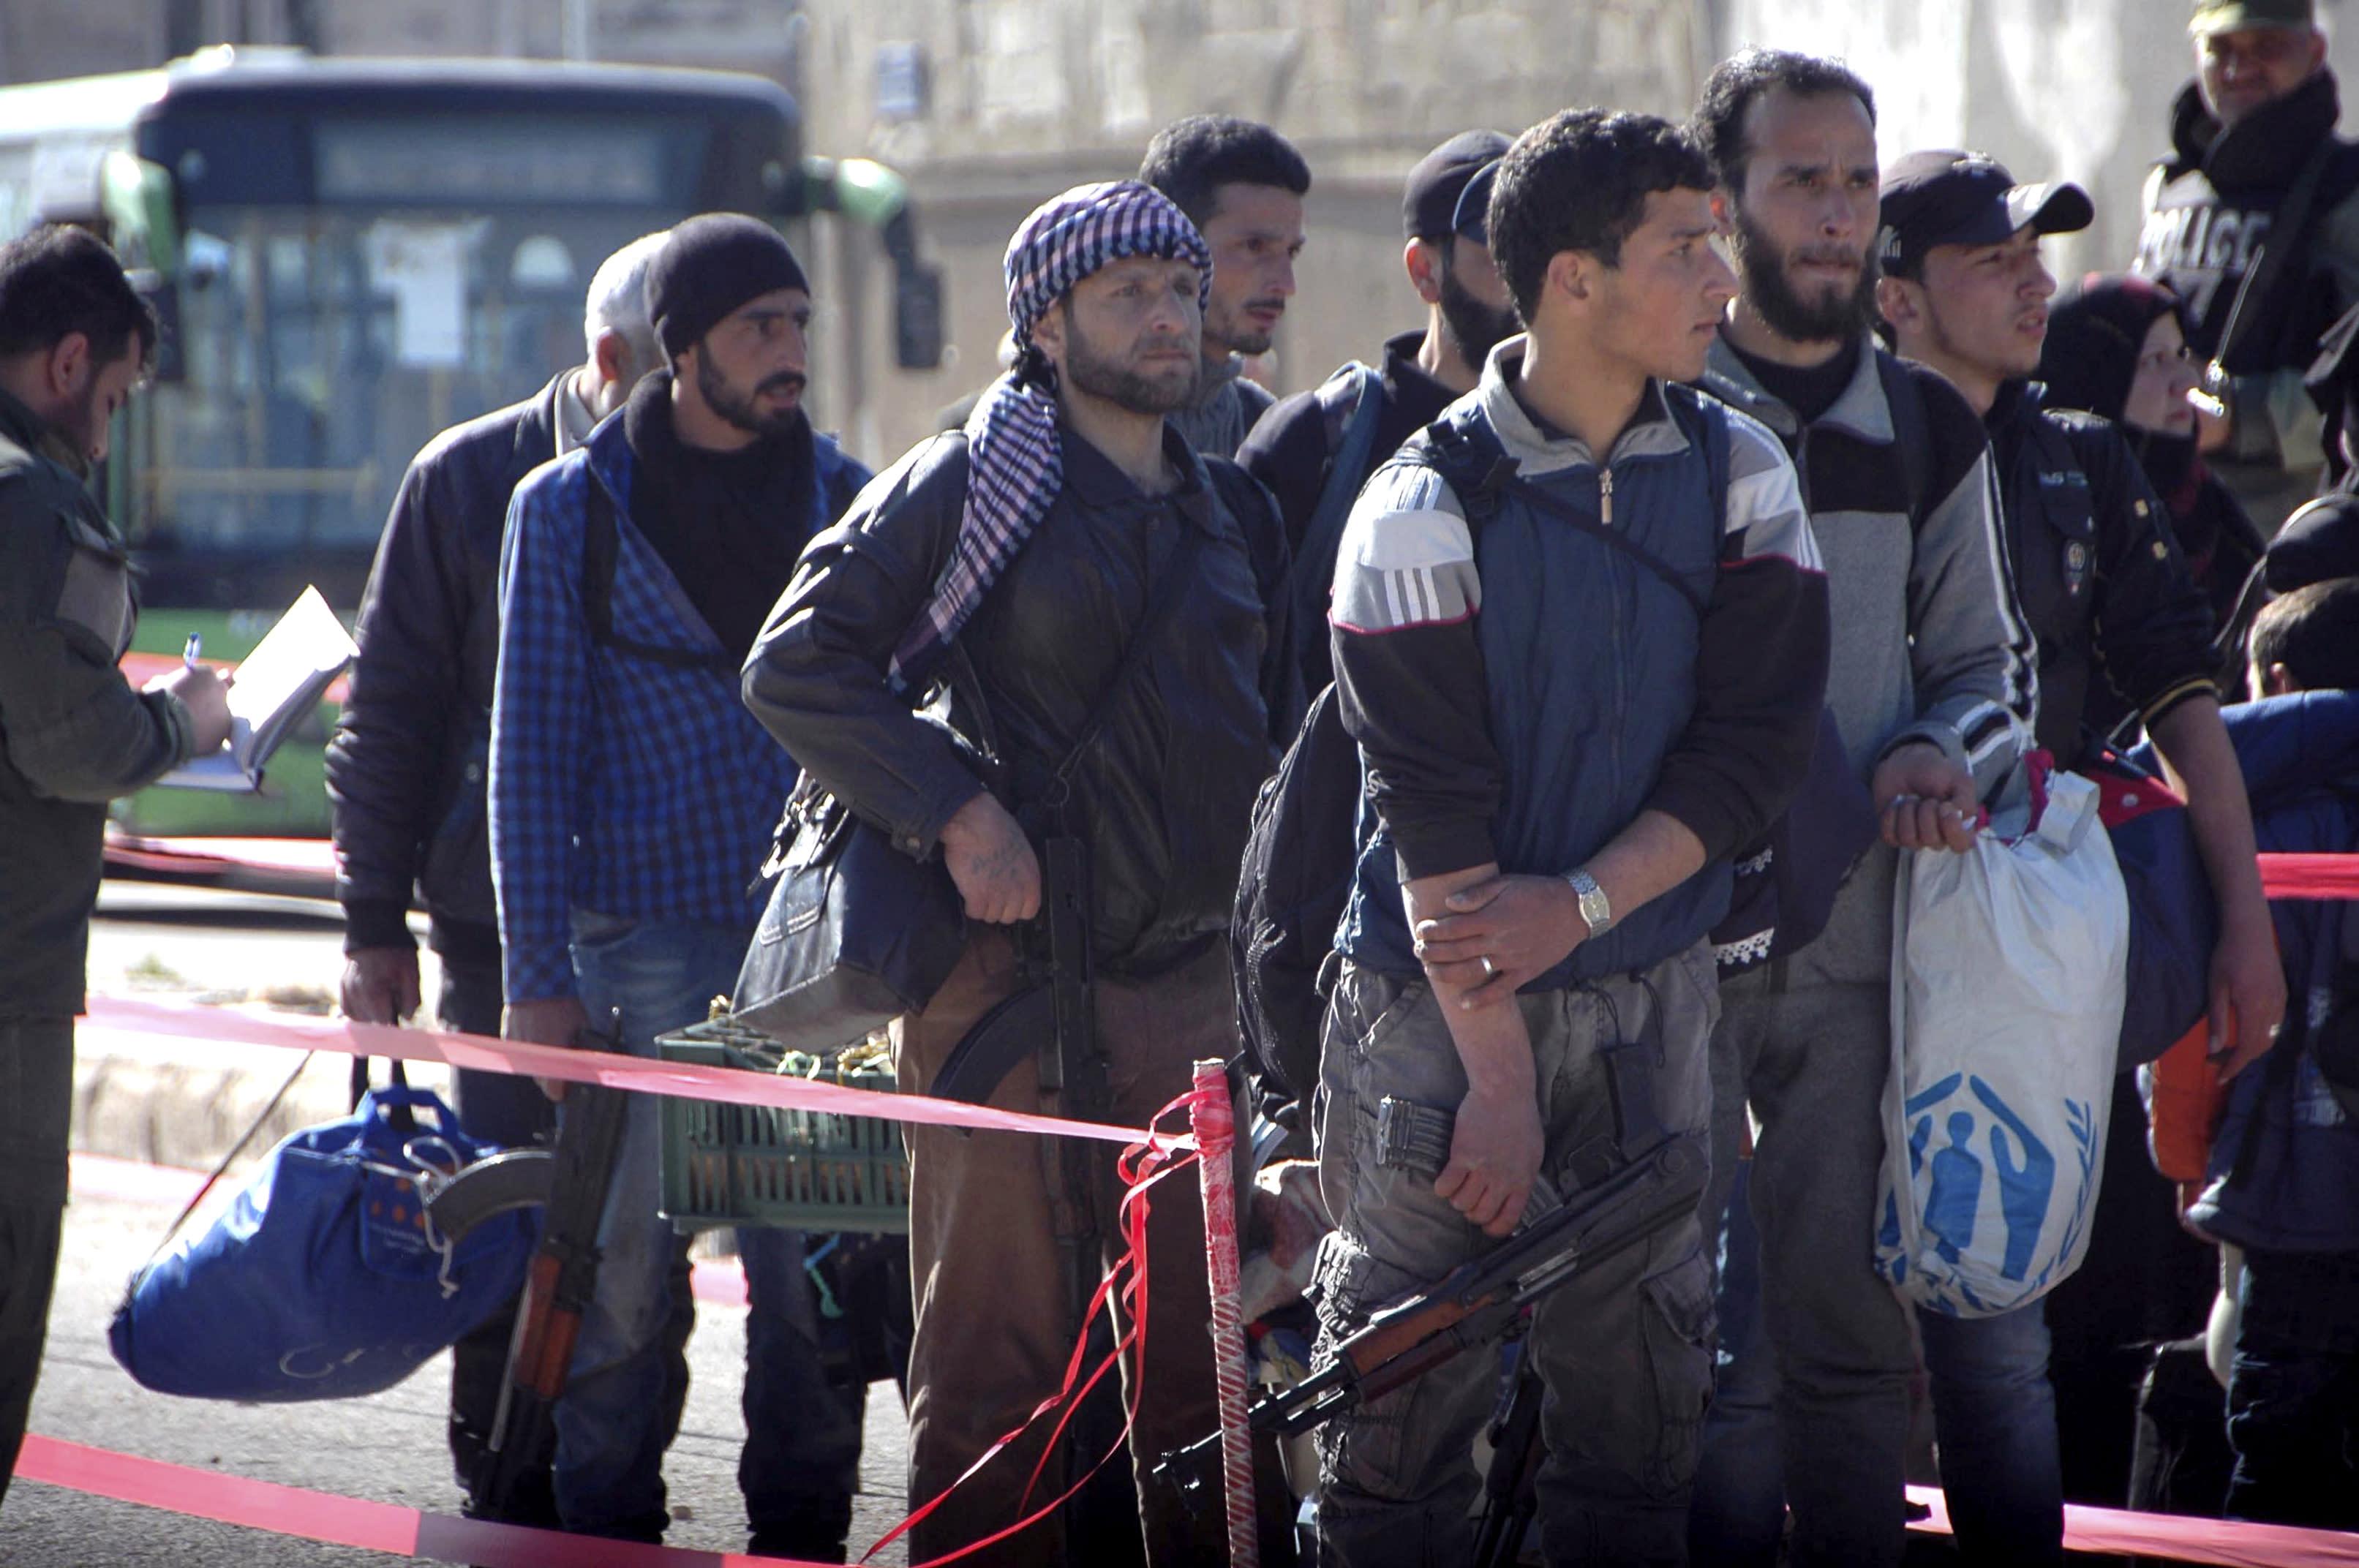 Airstrike kills 8 family members in northern Syria